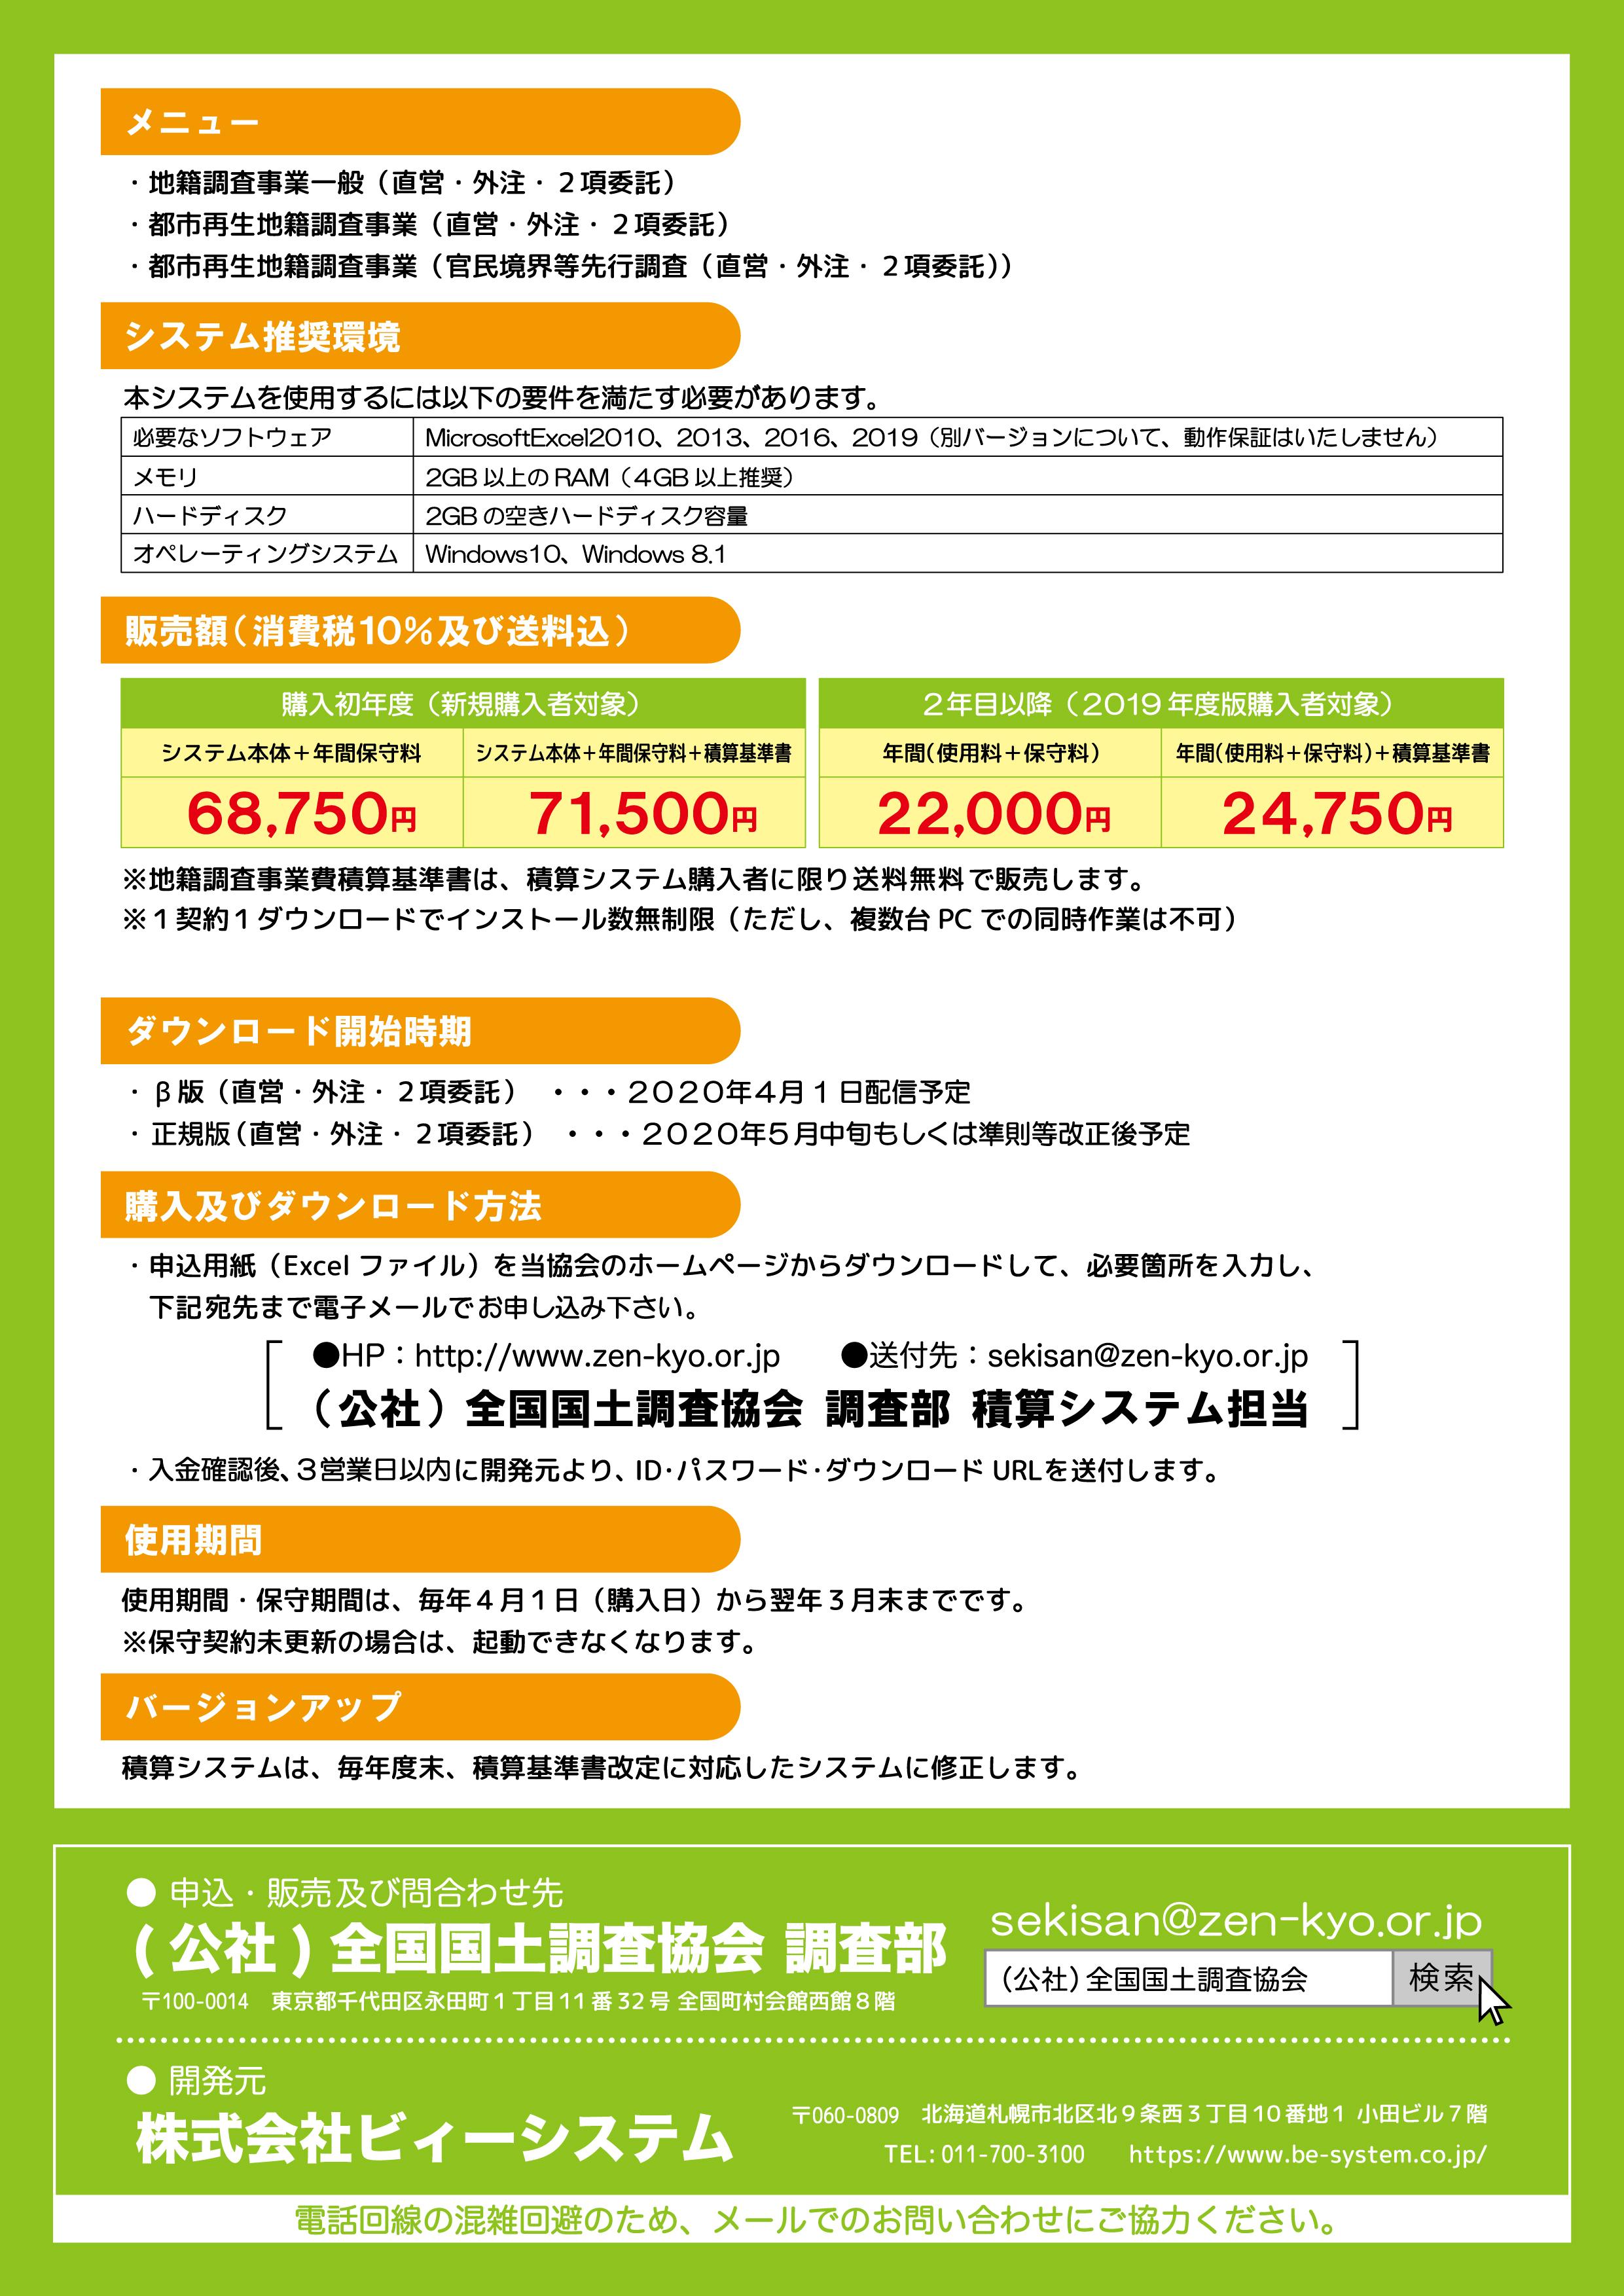 Chiseki-Catalog-20200227out-02